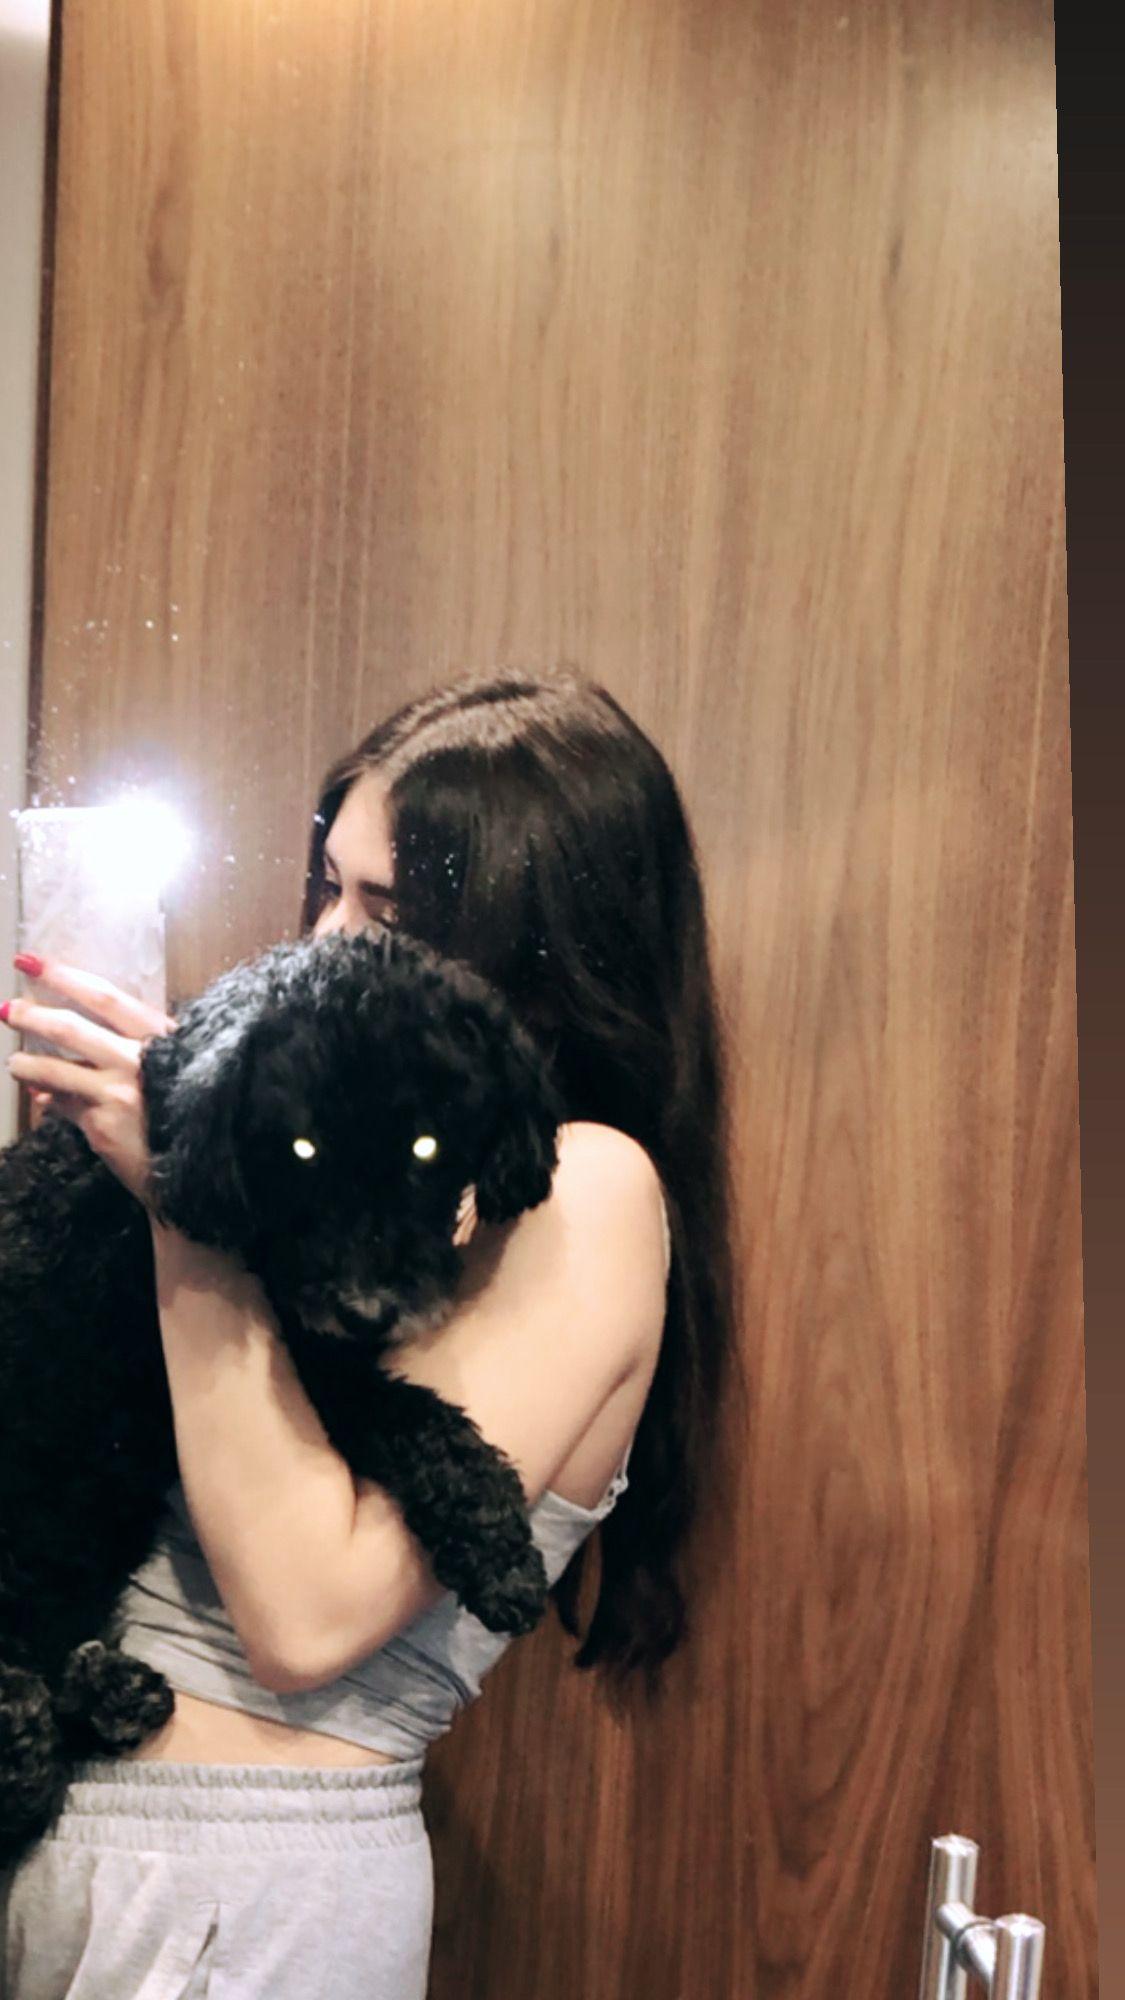 #dog #poodlepuppy #cuddle #cutedogs #cute #doglovers #brunettehair #longhair #joggerpants #loungewear #mood #hug